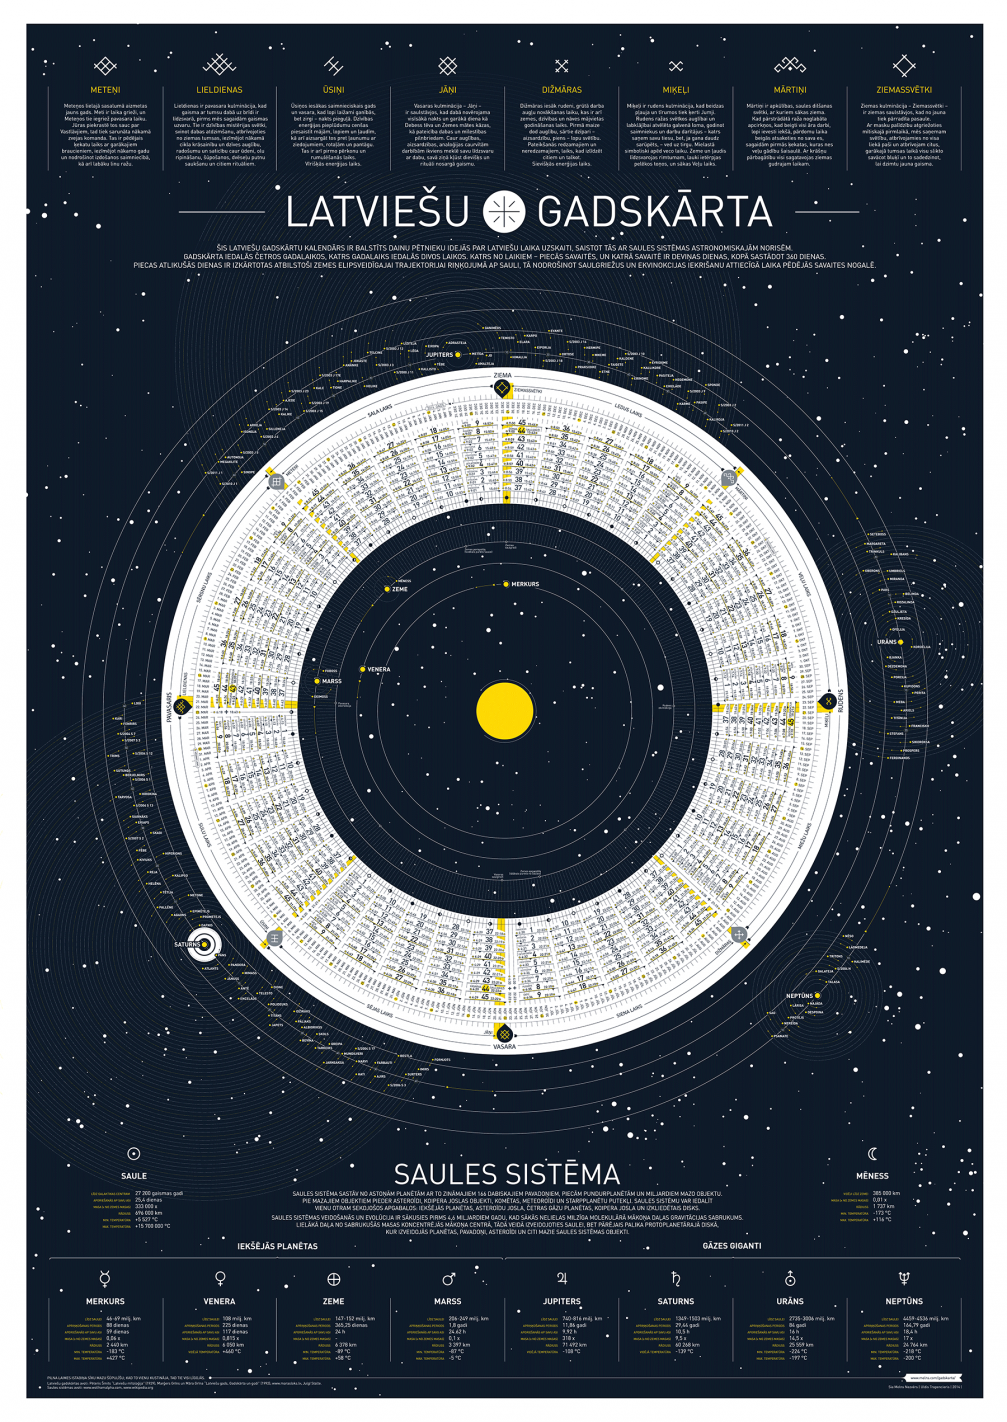 Gadskartu-kalendars-01-1007x1422